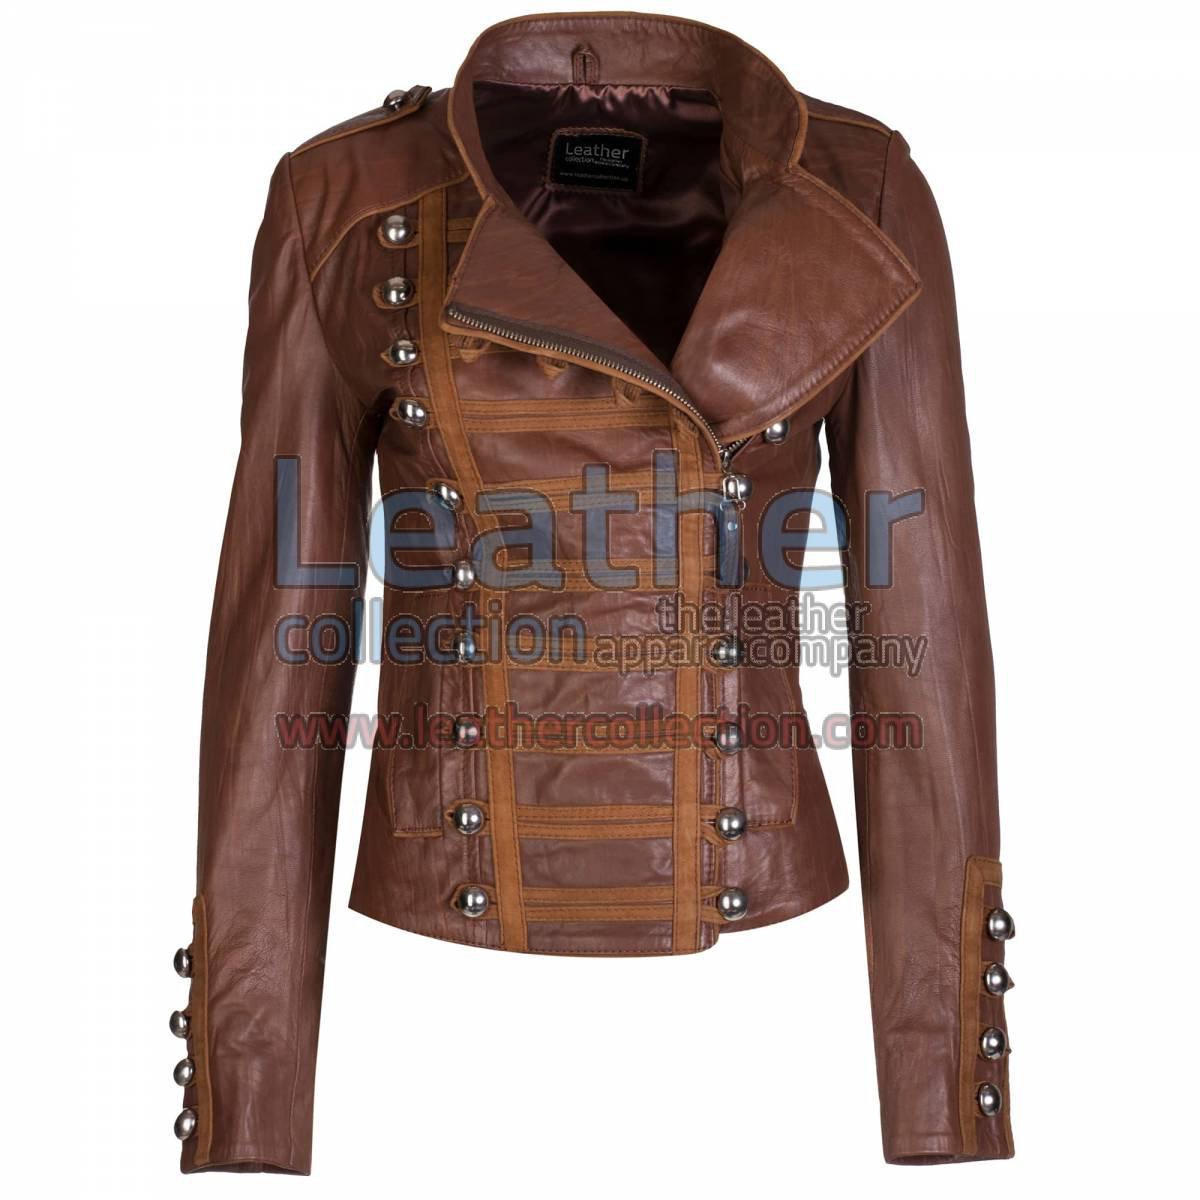 Princess Antique Brown Leather Jacket